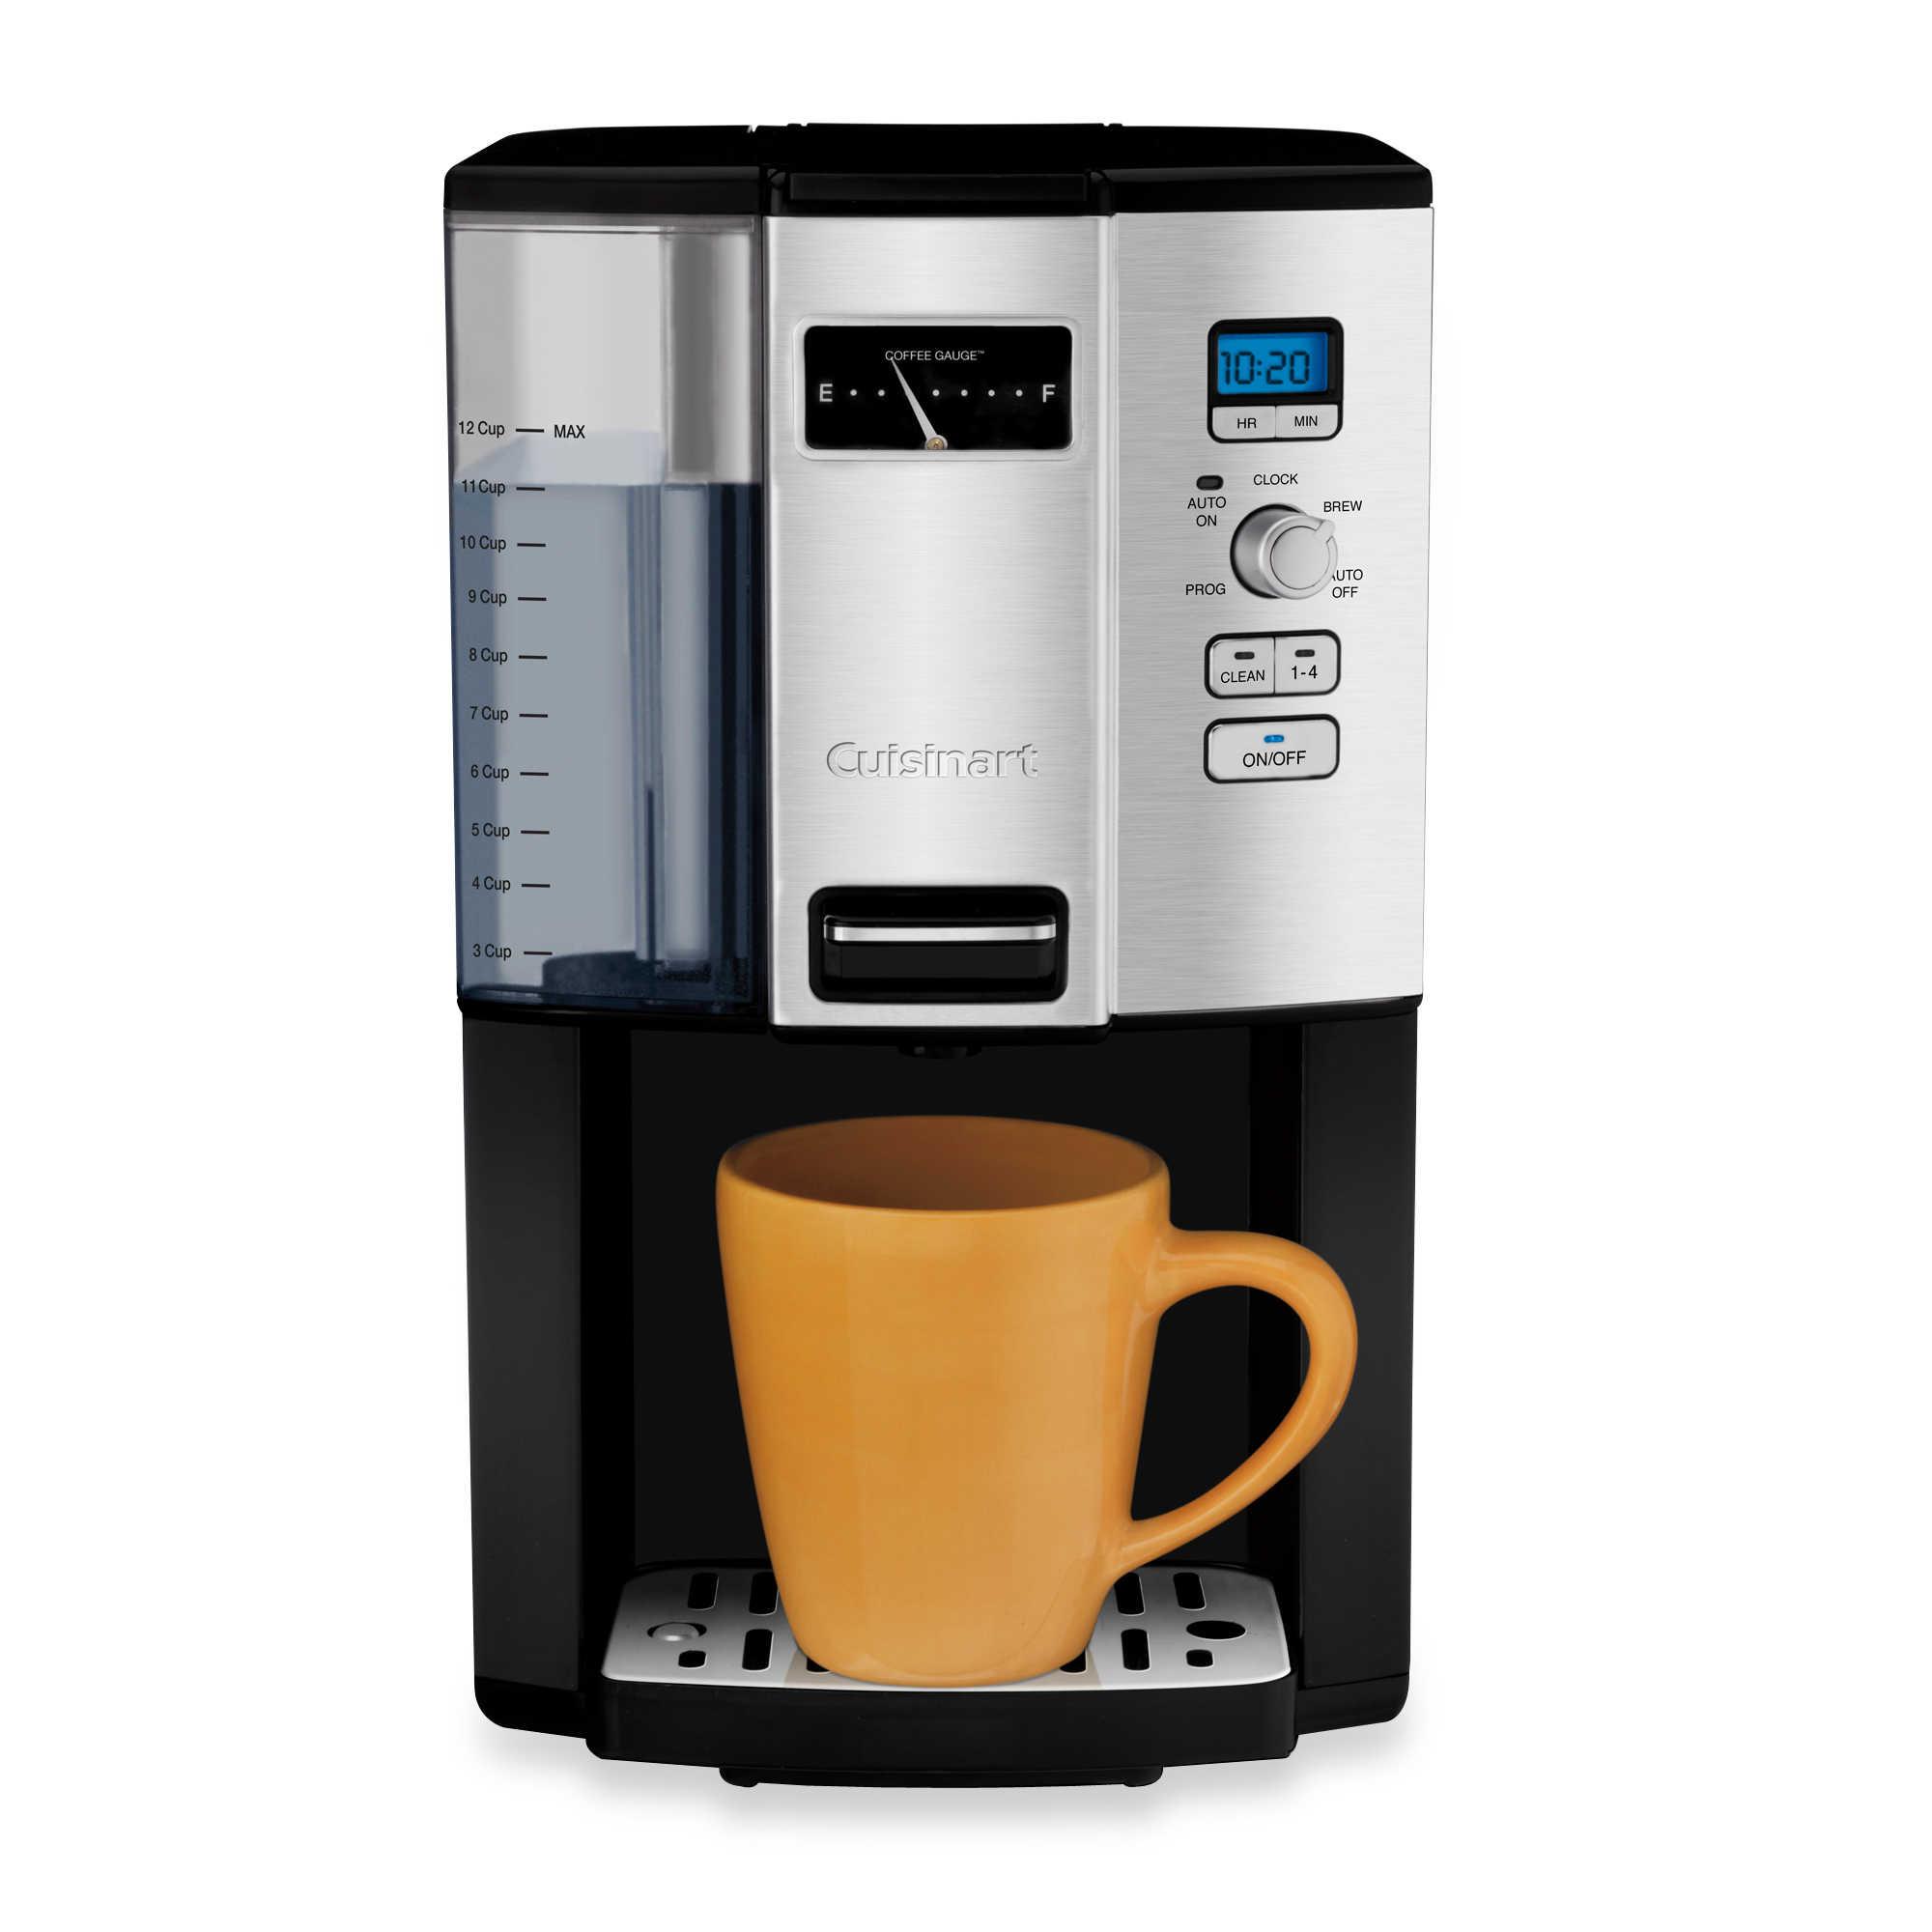 drinker built coffee plumbing maker plumbed view in